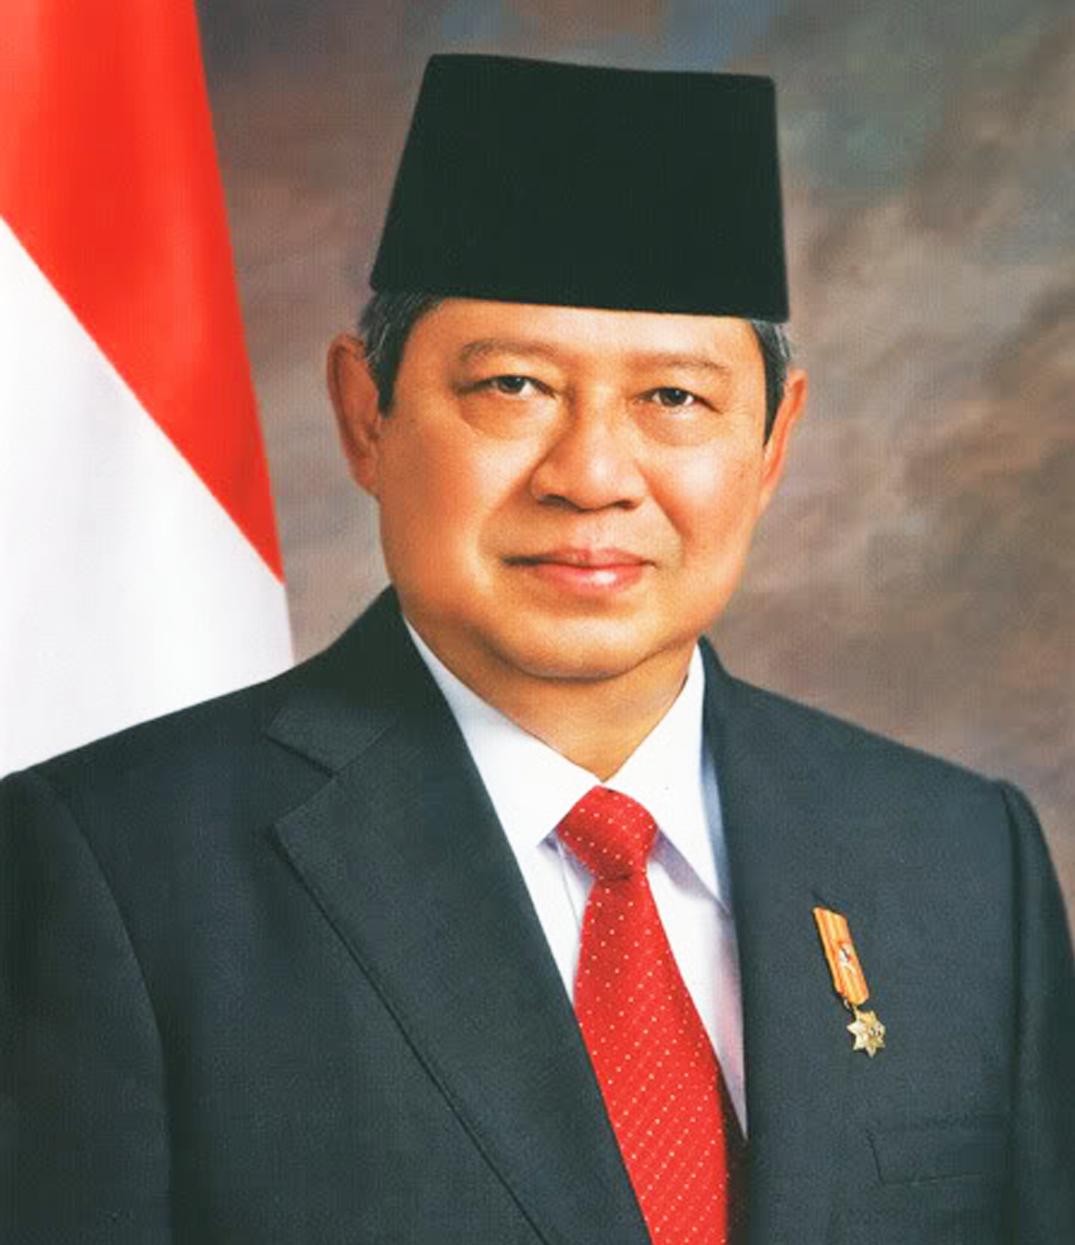 Presiden Susilo Bambang Yudhoyono berwarna